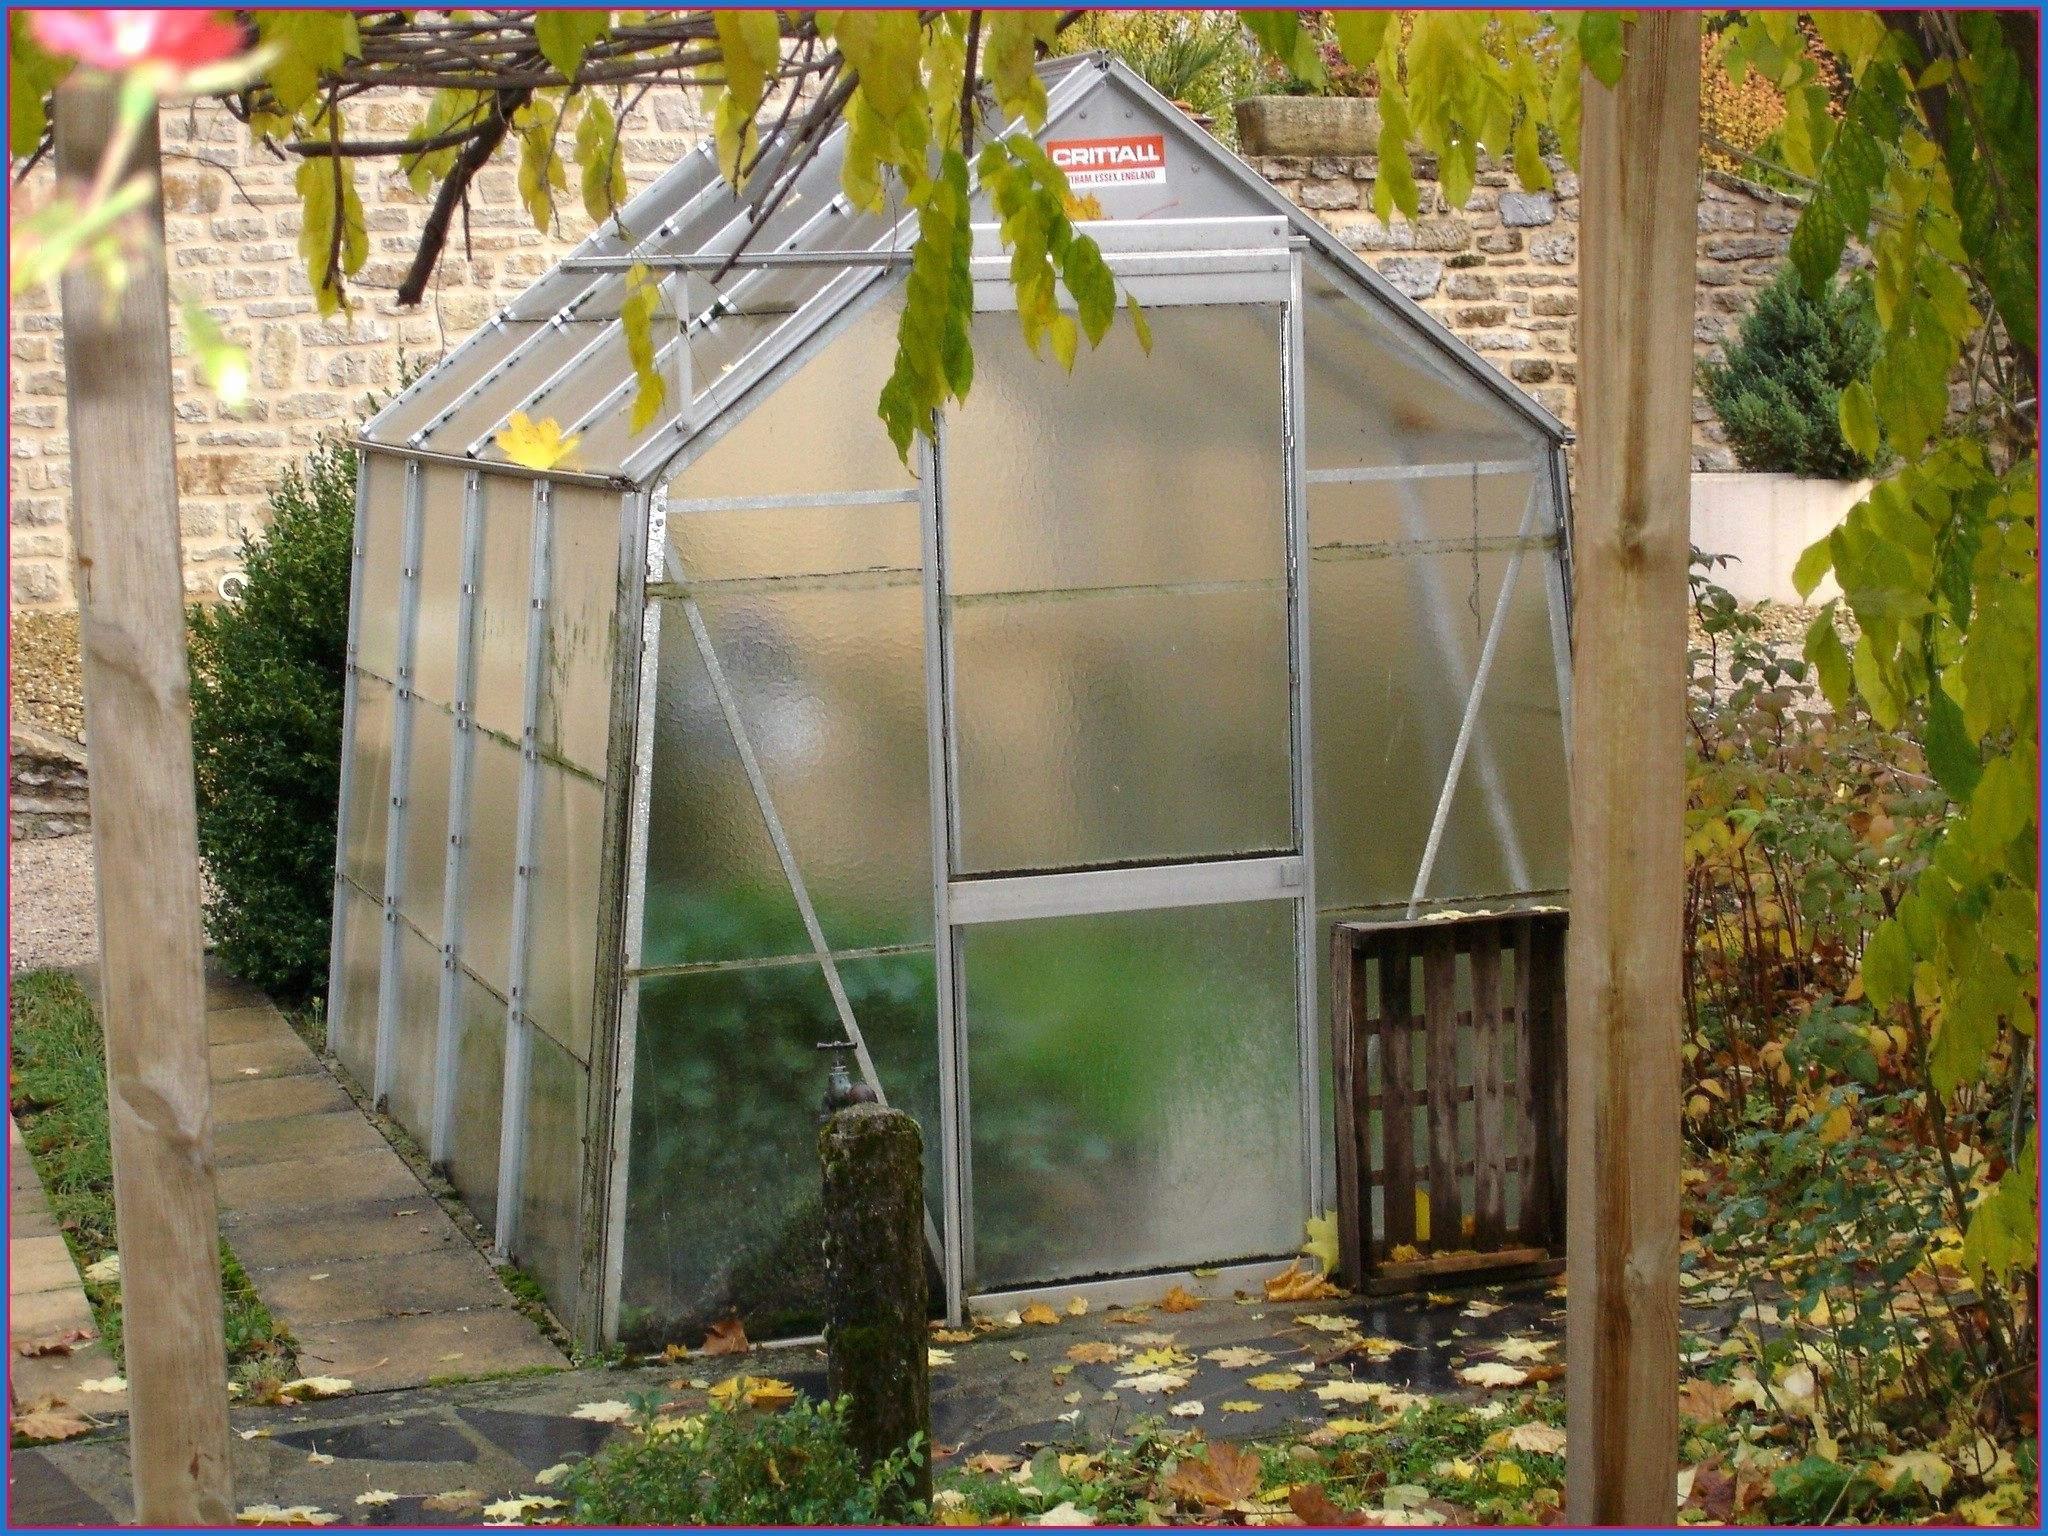 Serre De Gouaix Meilleur De Image 15 Magnifique Serre De Jardin Polycarbonate Galerie De Cuisine